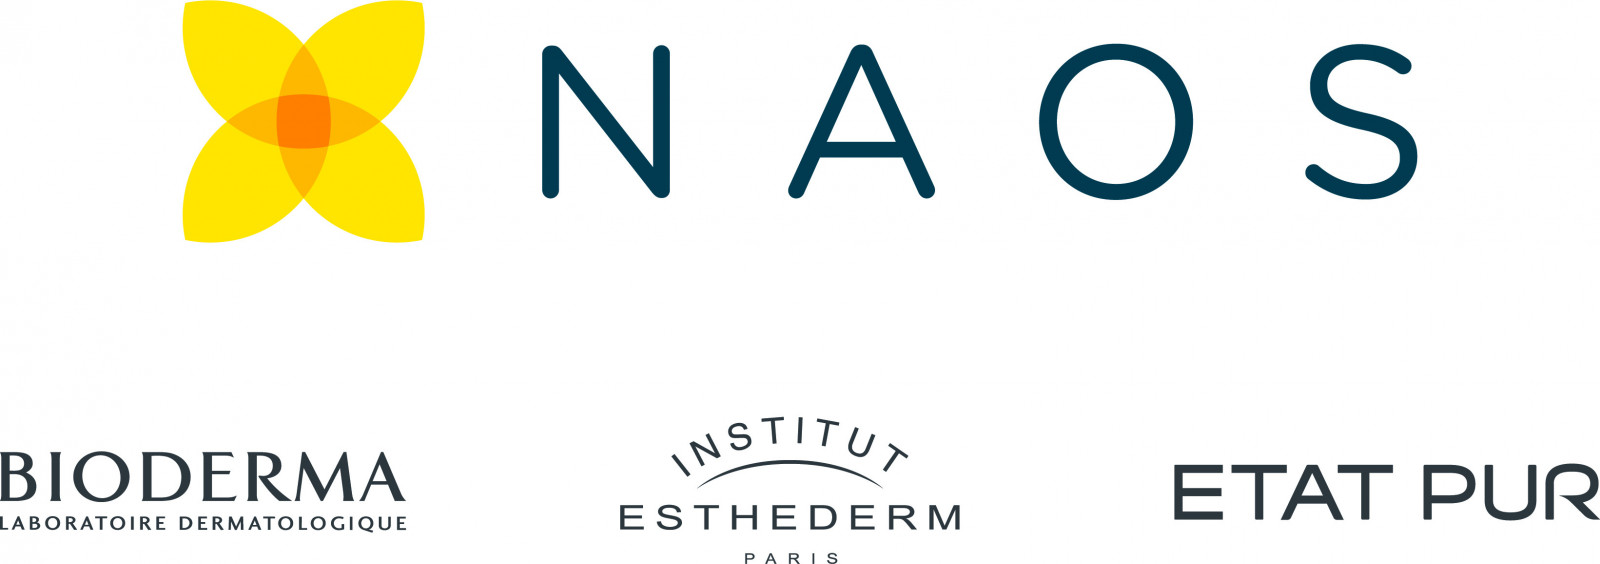 Naos - BIODERMA